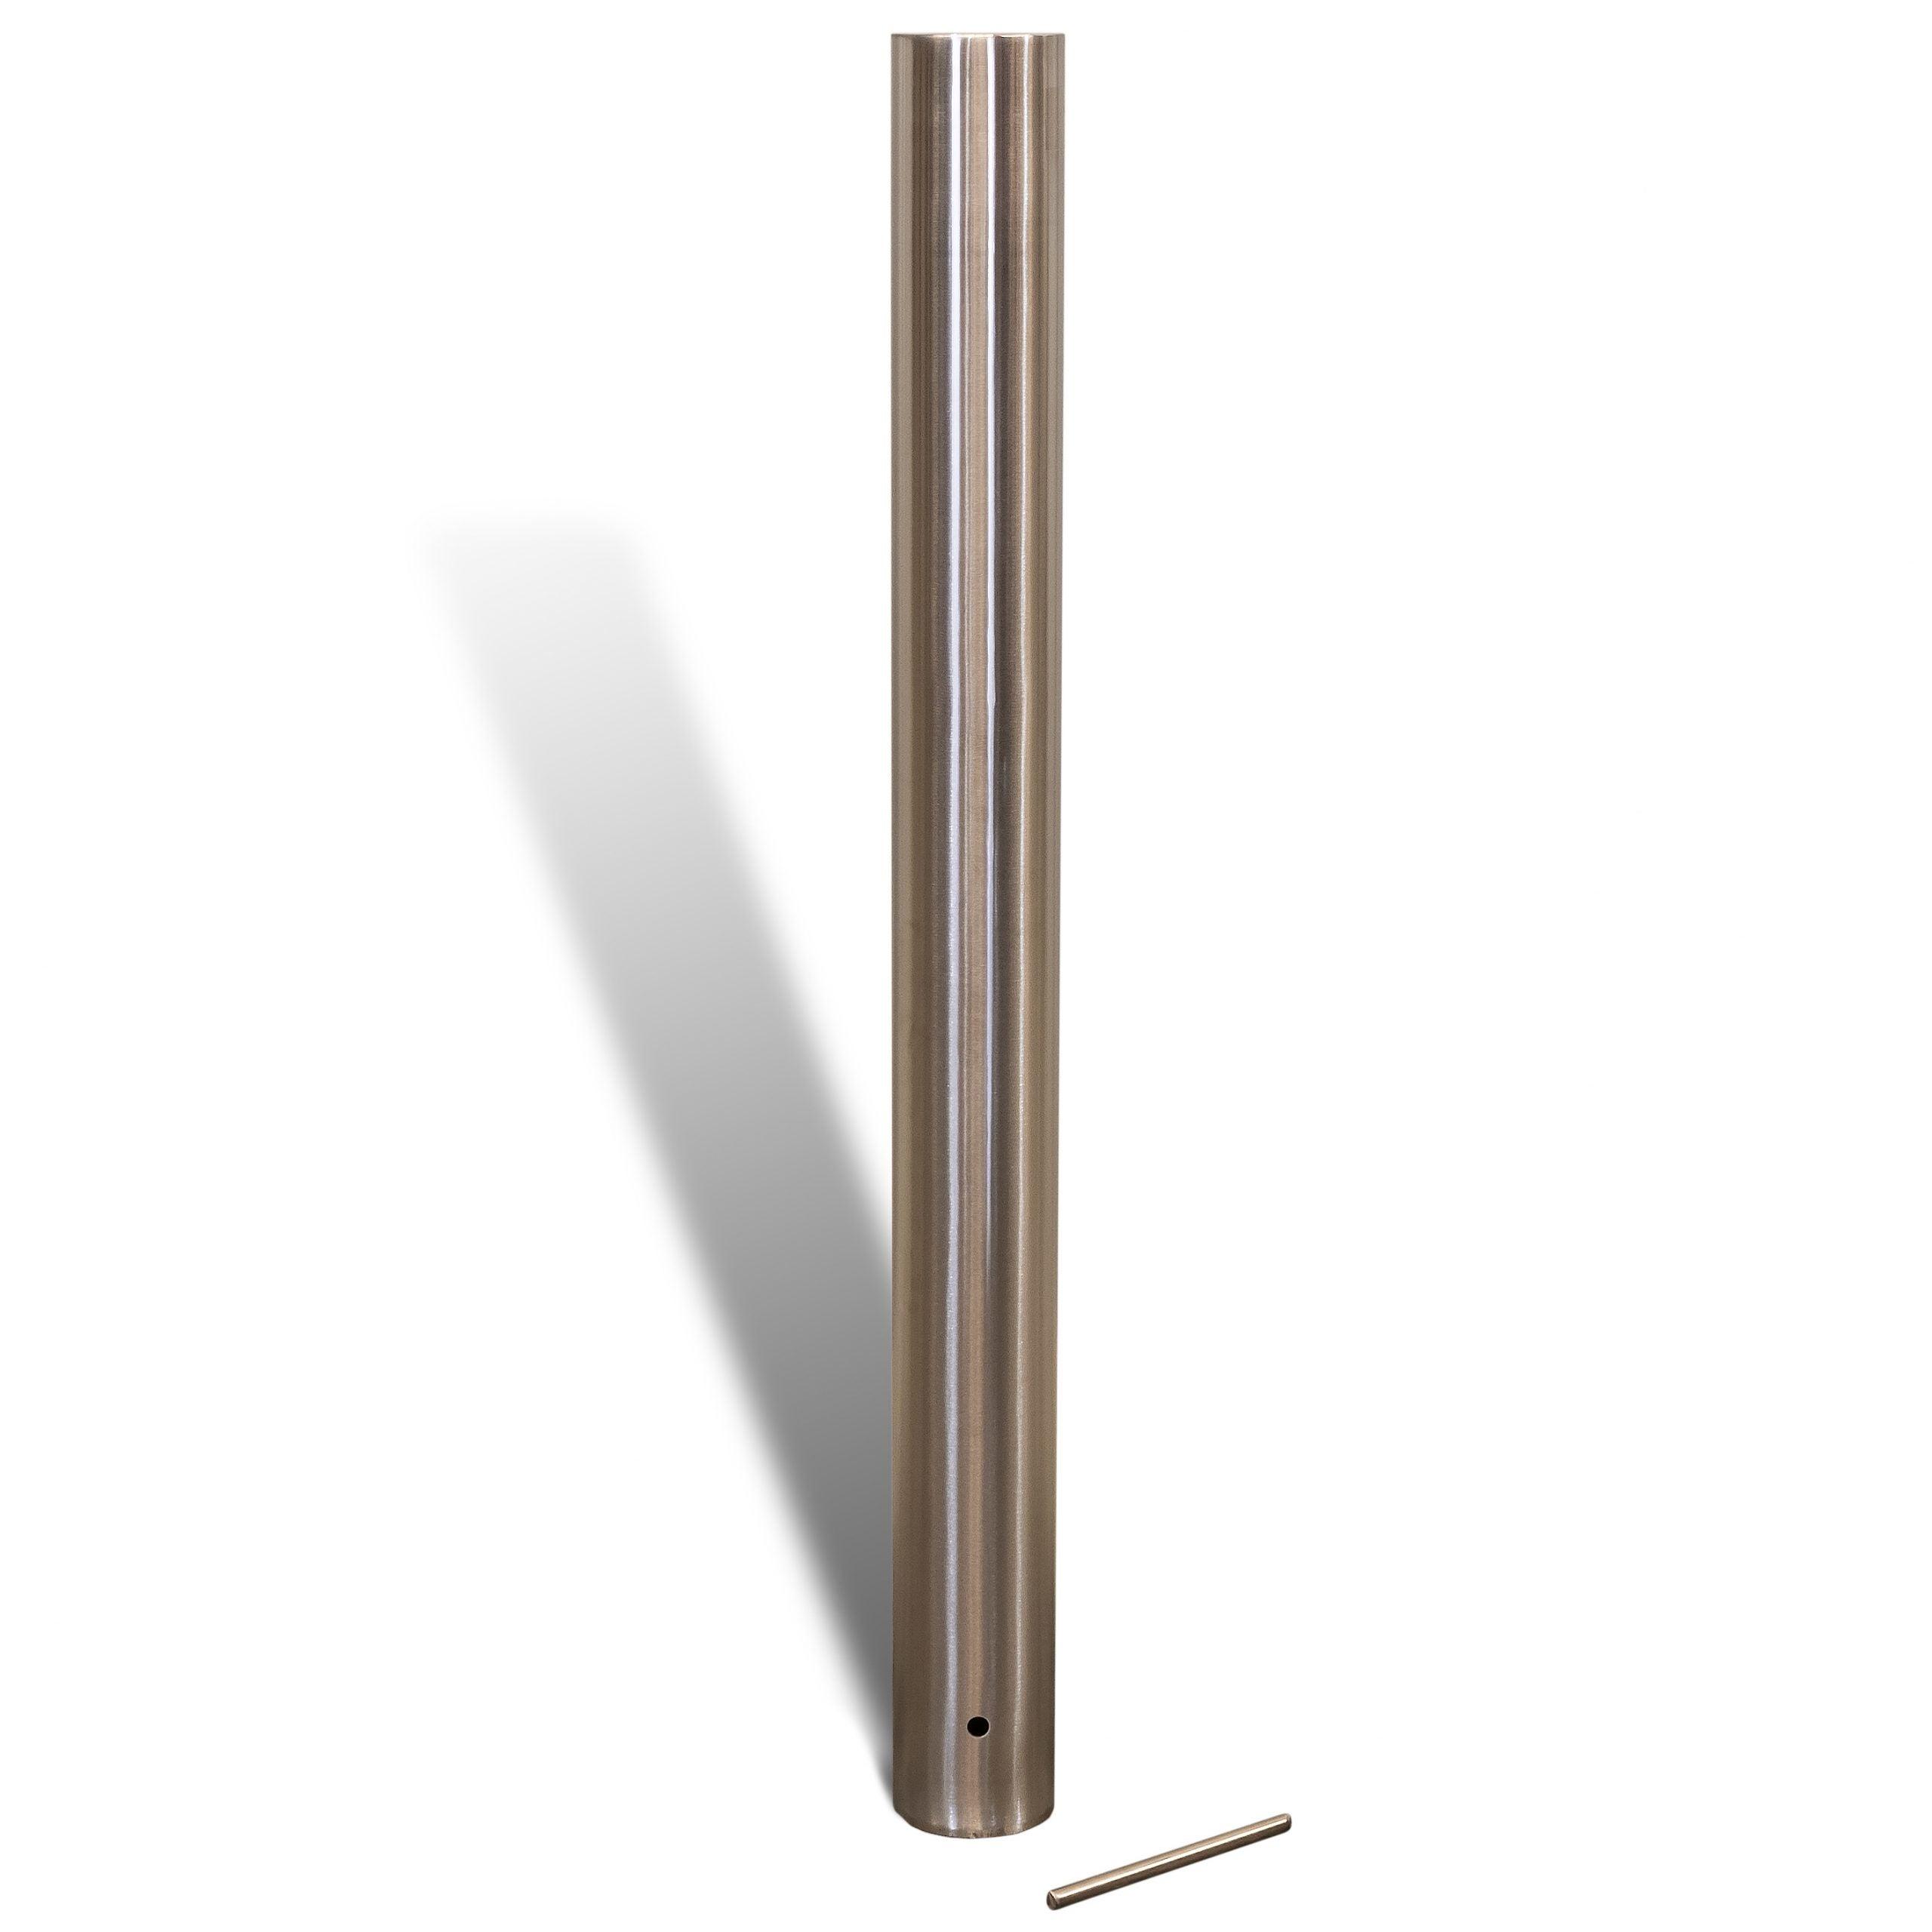 Inground Bollard - 140mm - Stainless Steel